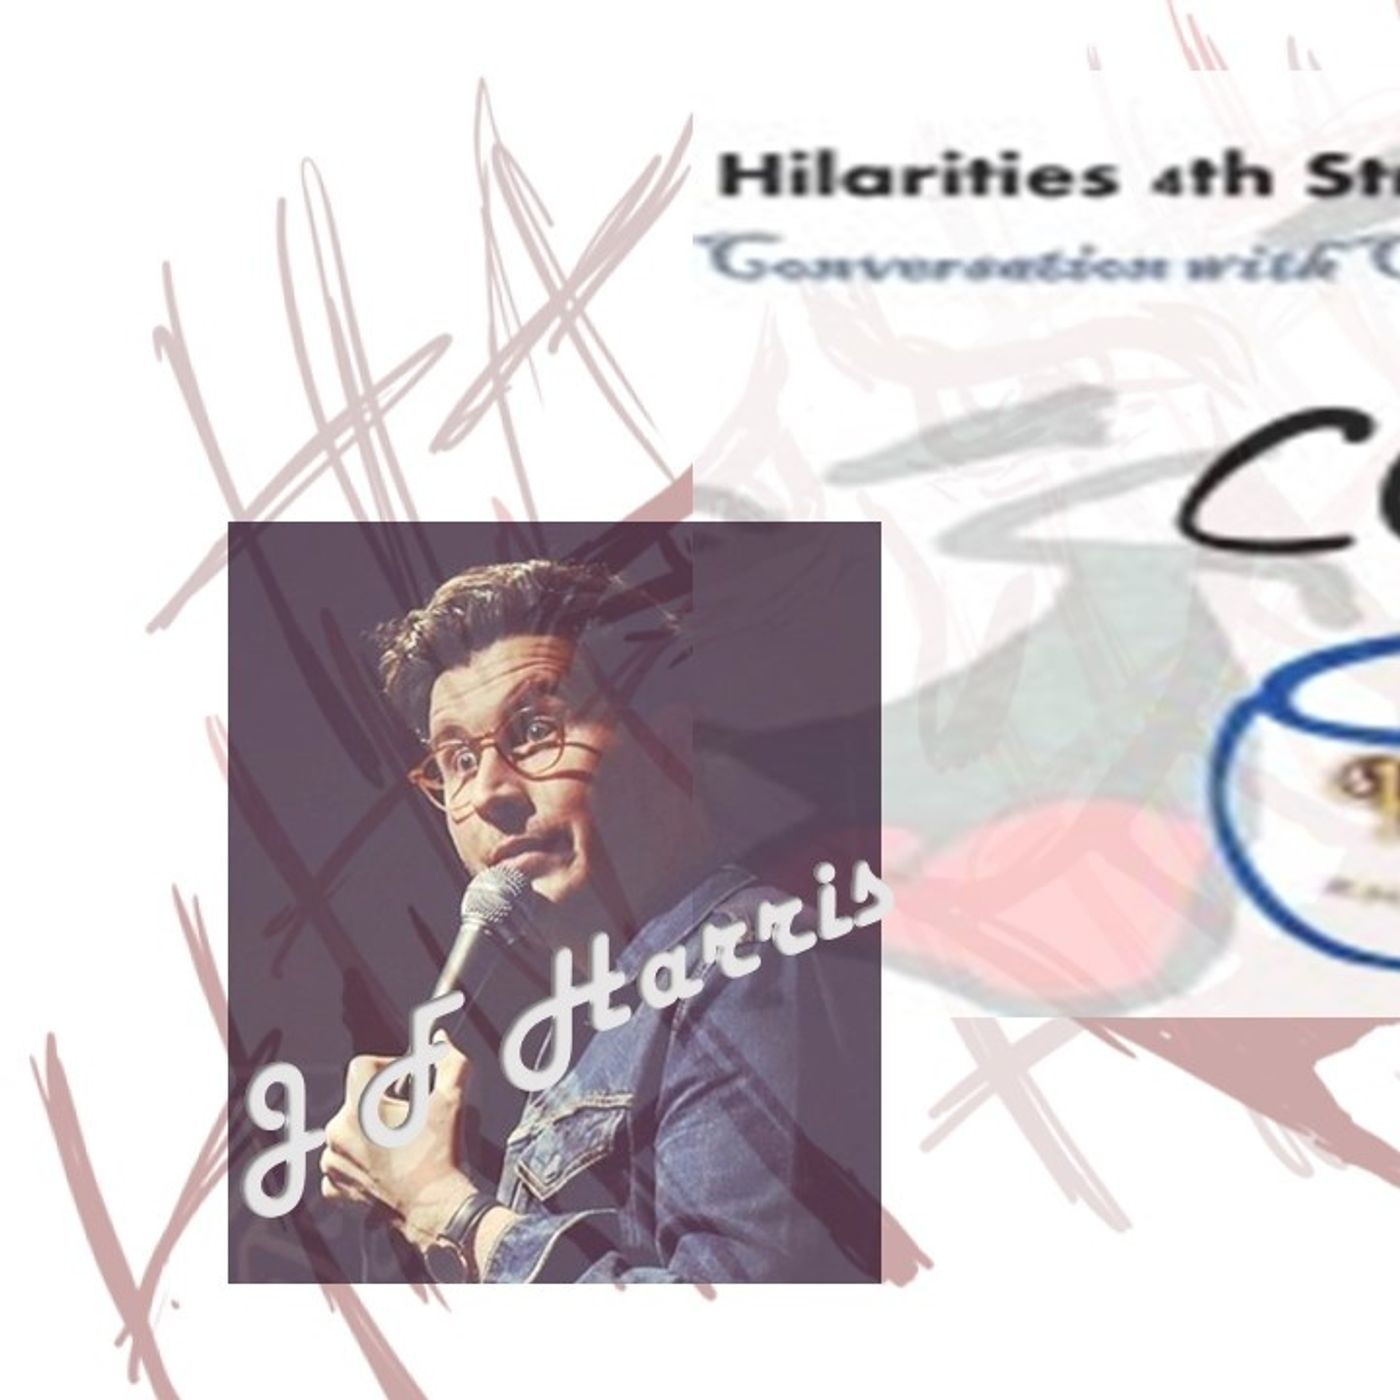 j-f-harris-conversation-with-comics-6_8_19